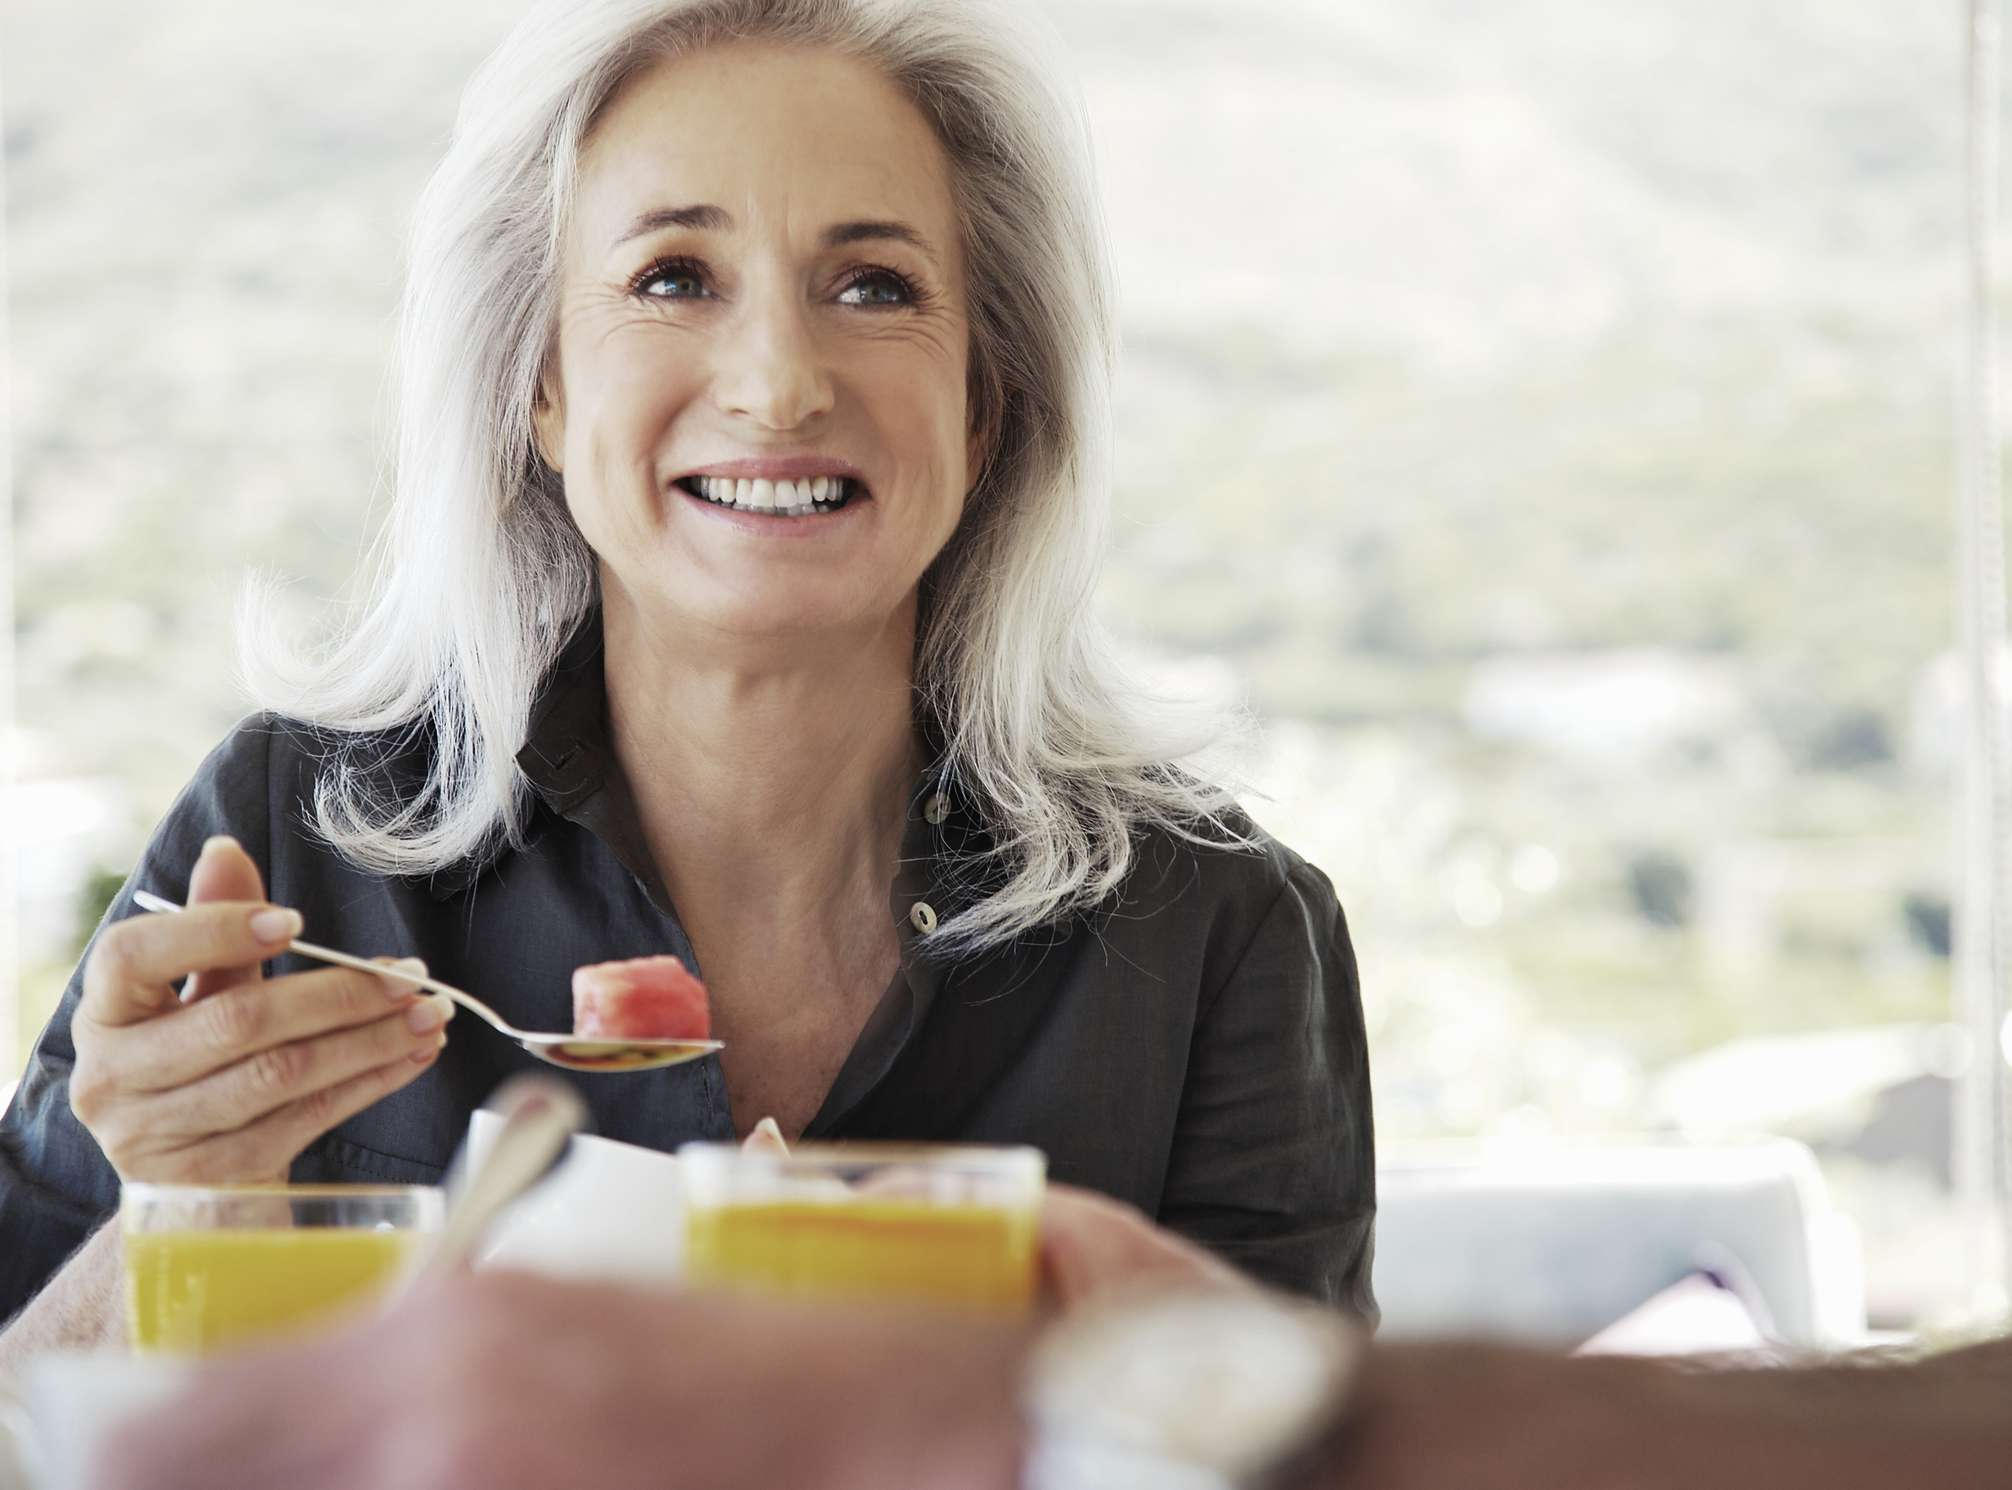 mature woman eating breakfast